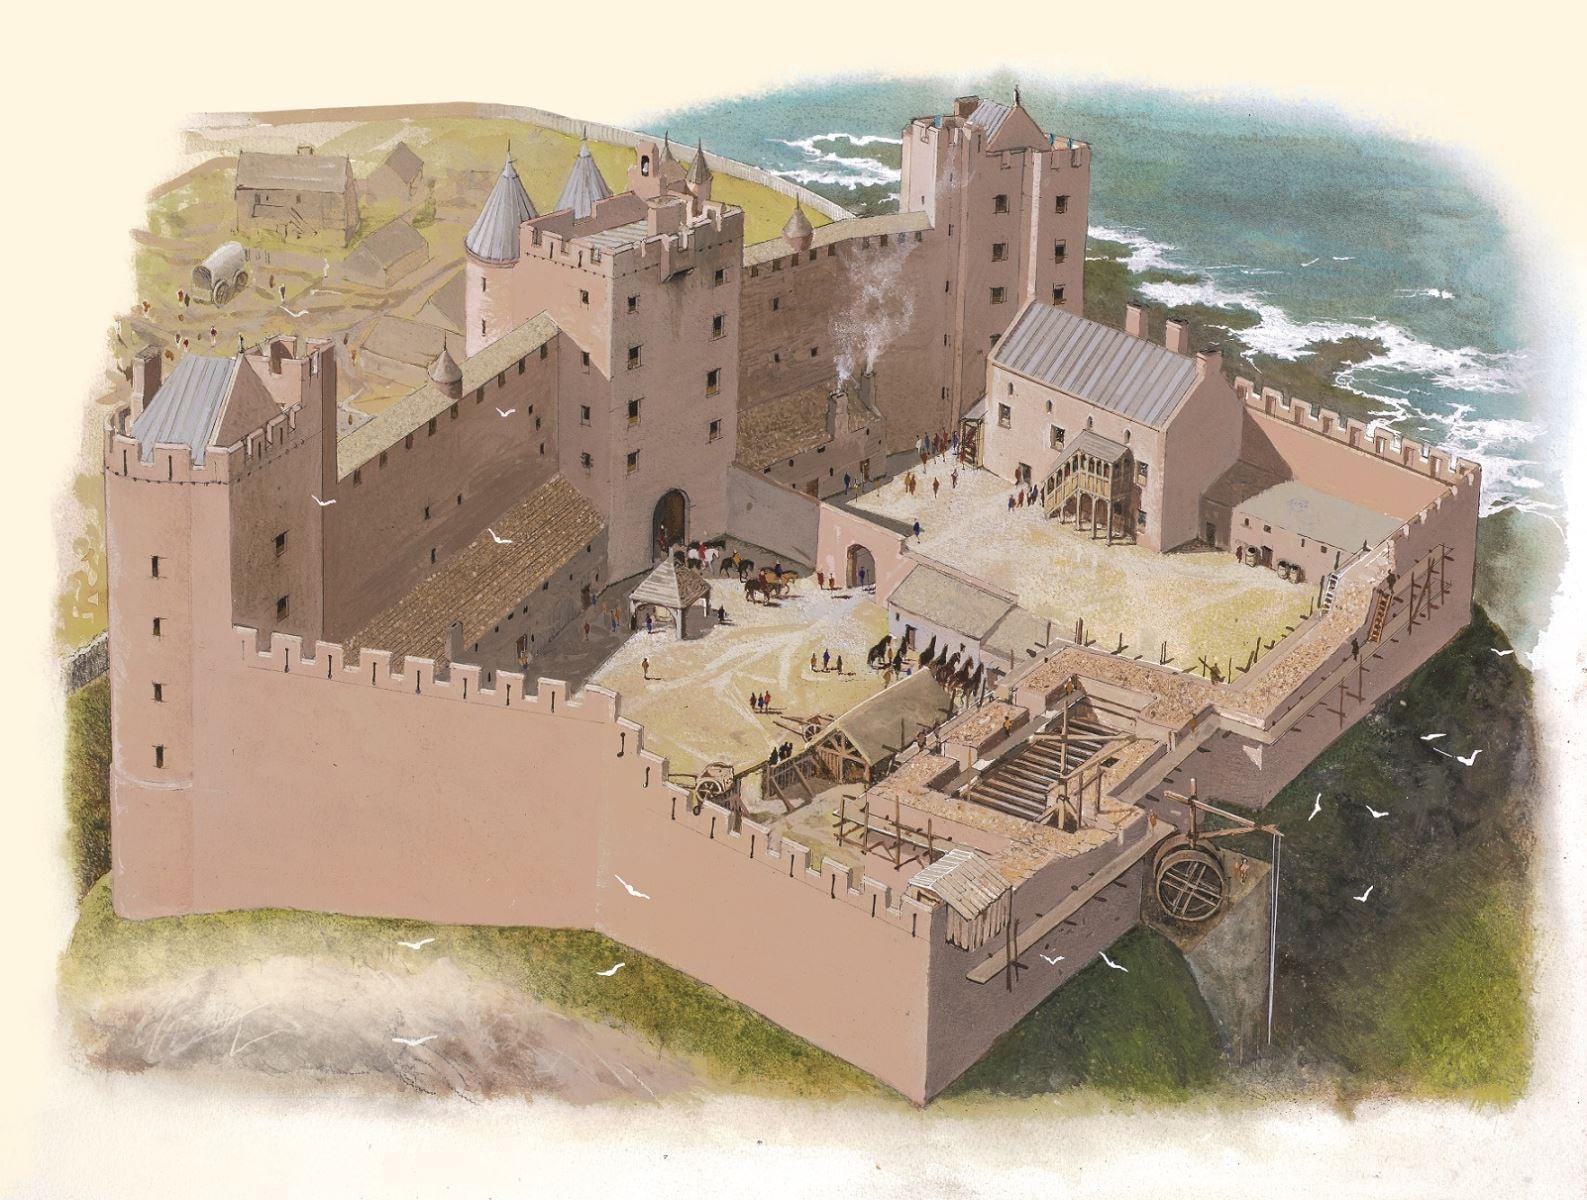 imports_CESC_copyright-historic-scotland-1-_49718.jpg